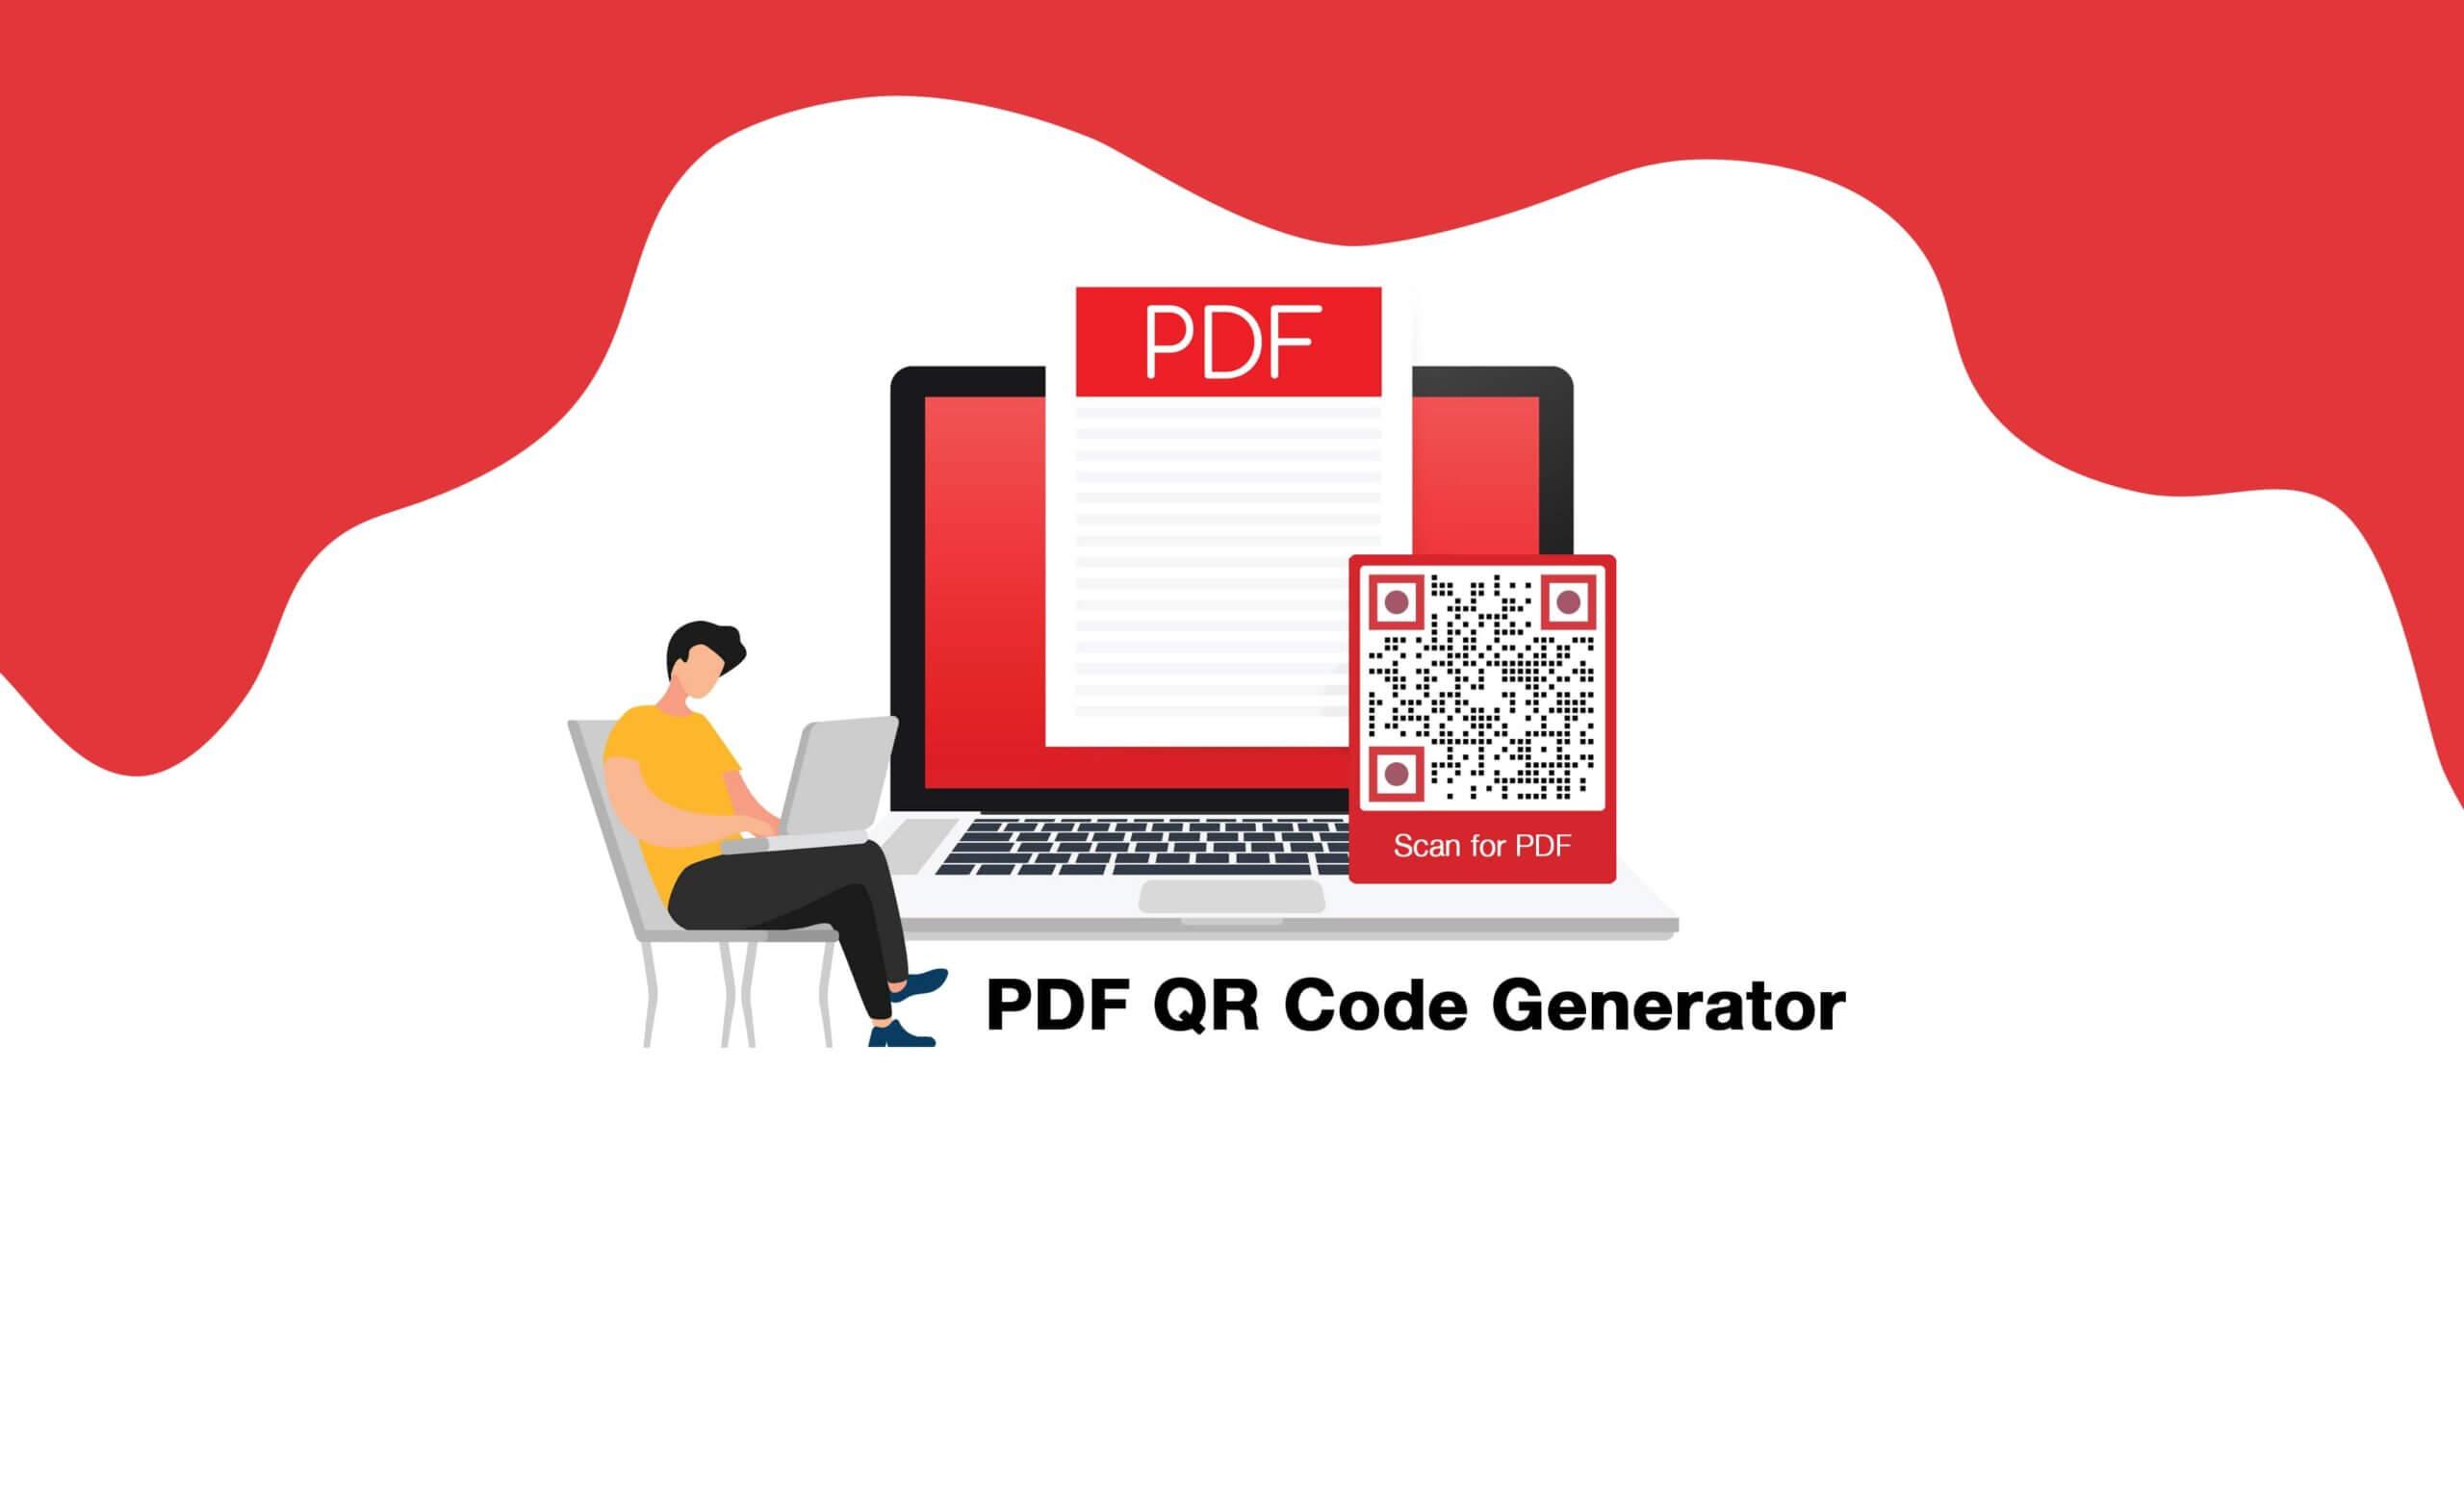 qr code for pdf file